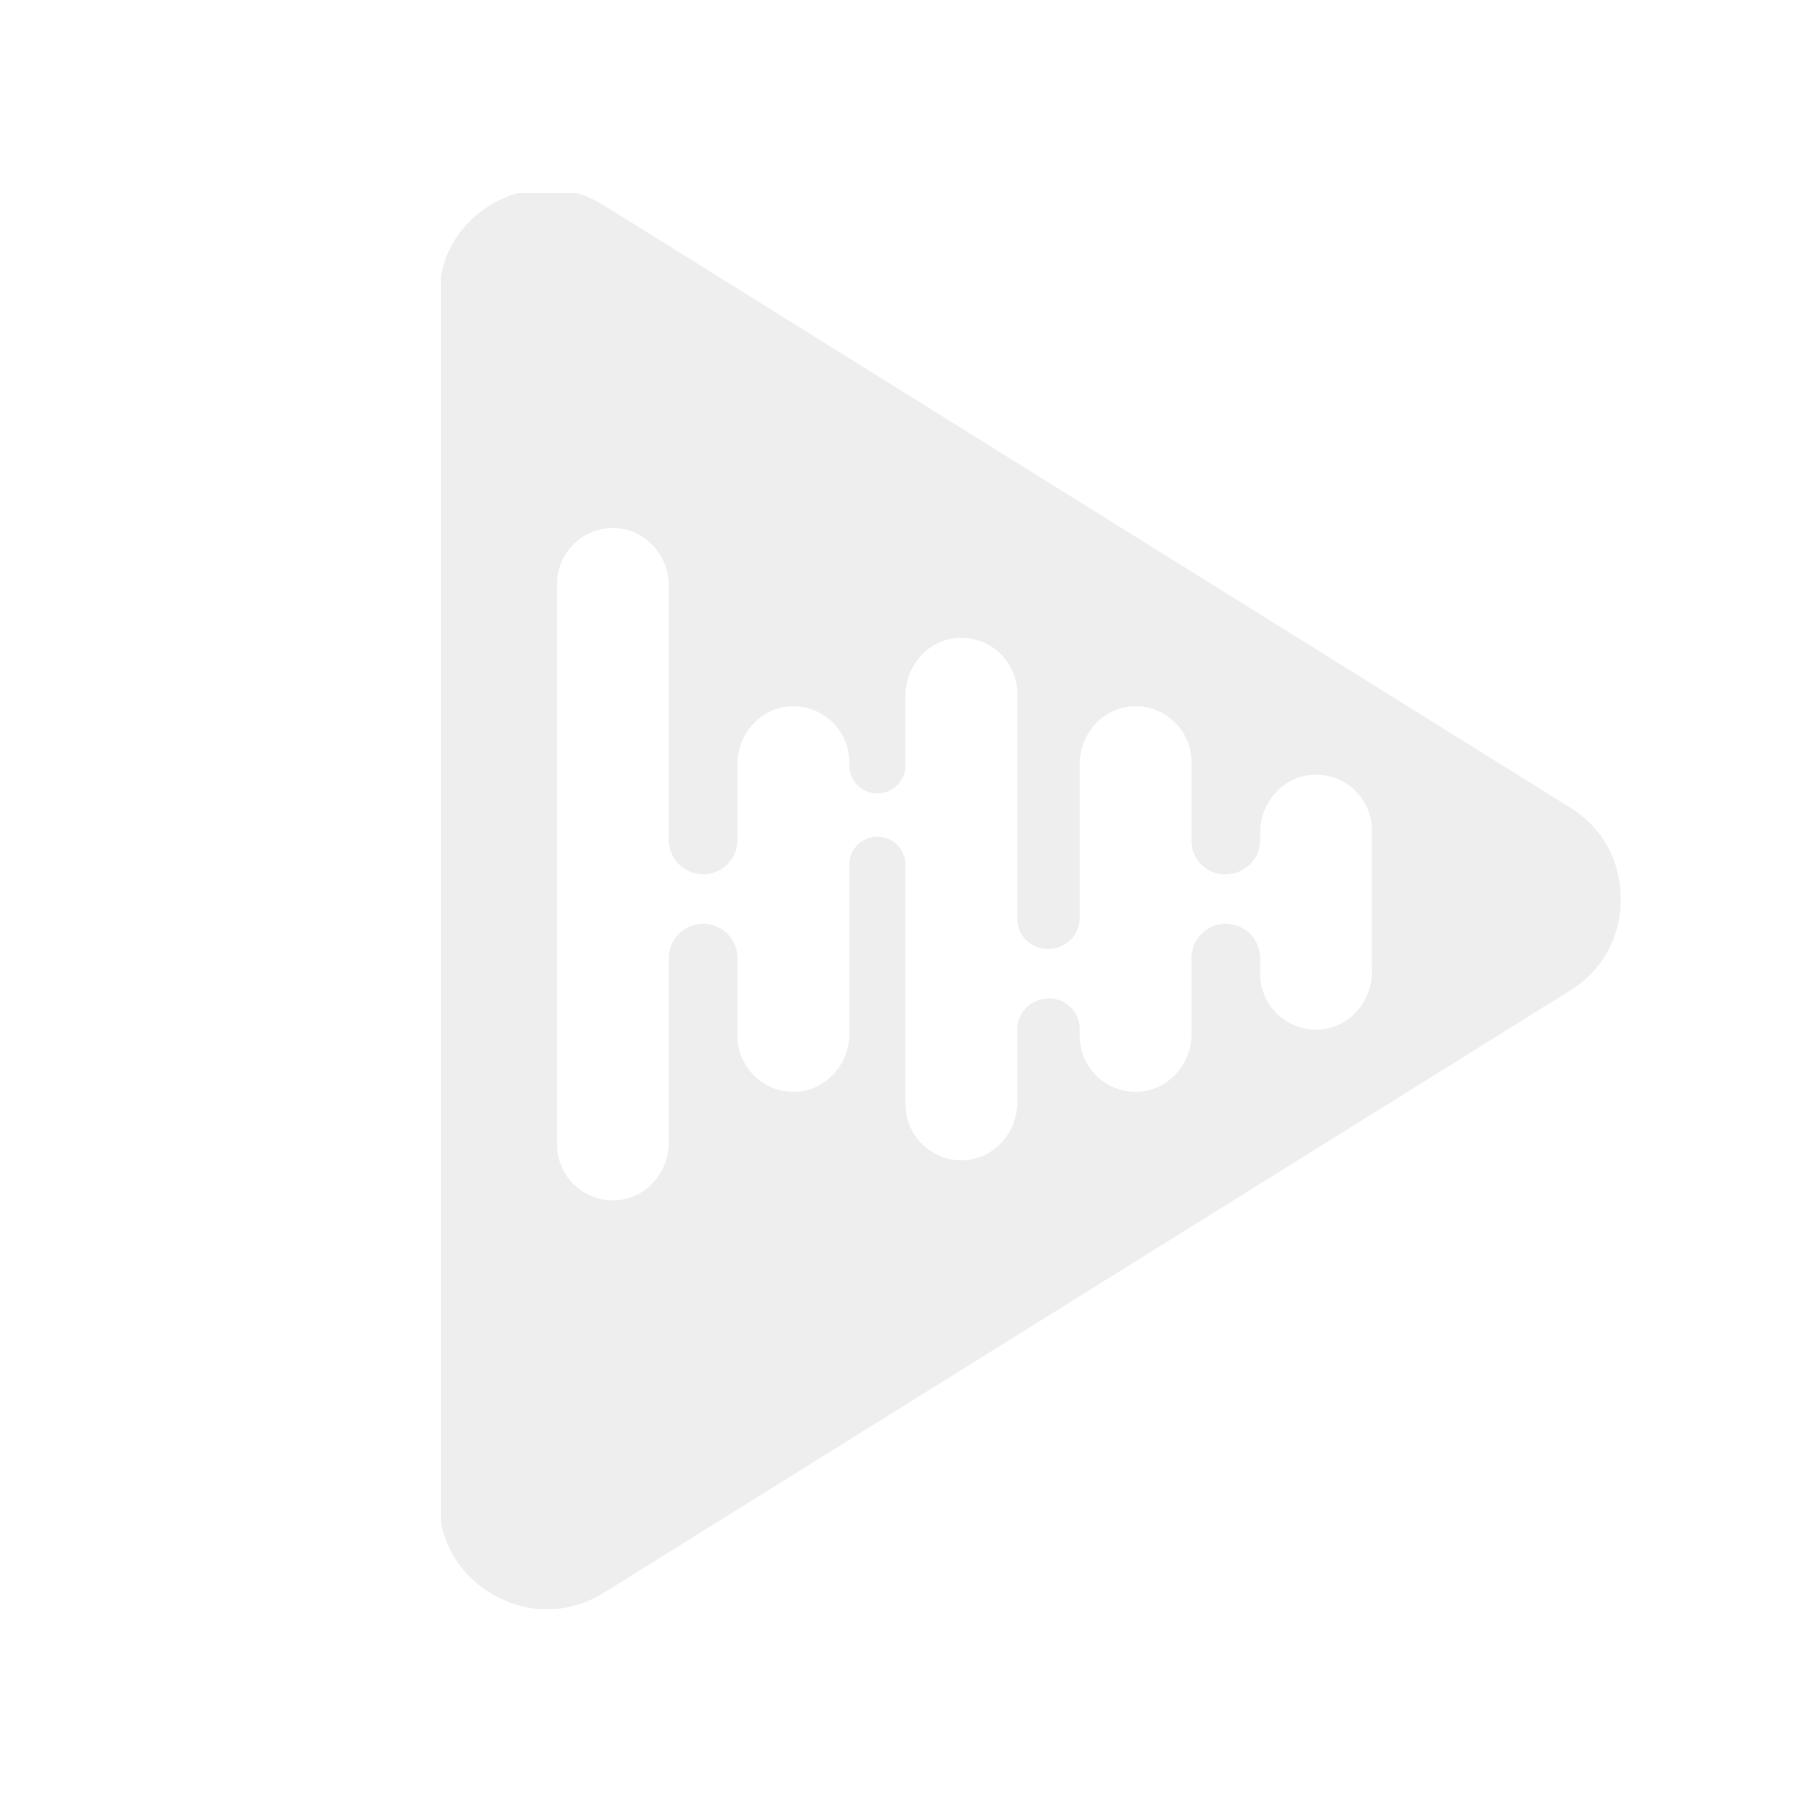 Kufatec Fistune 39531-4